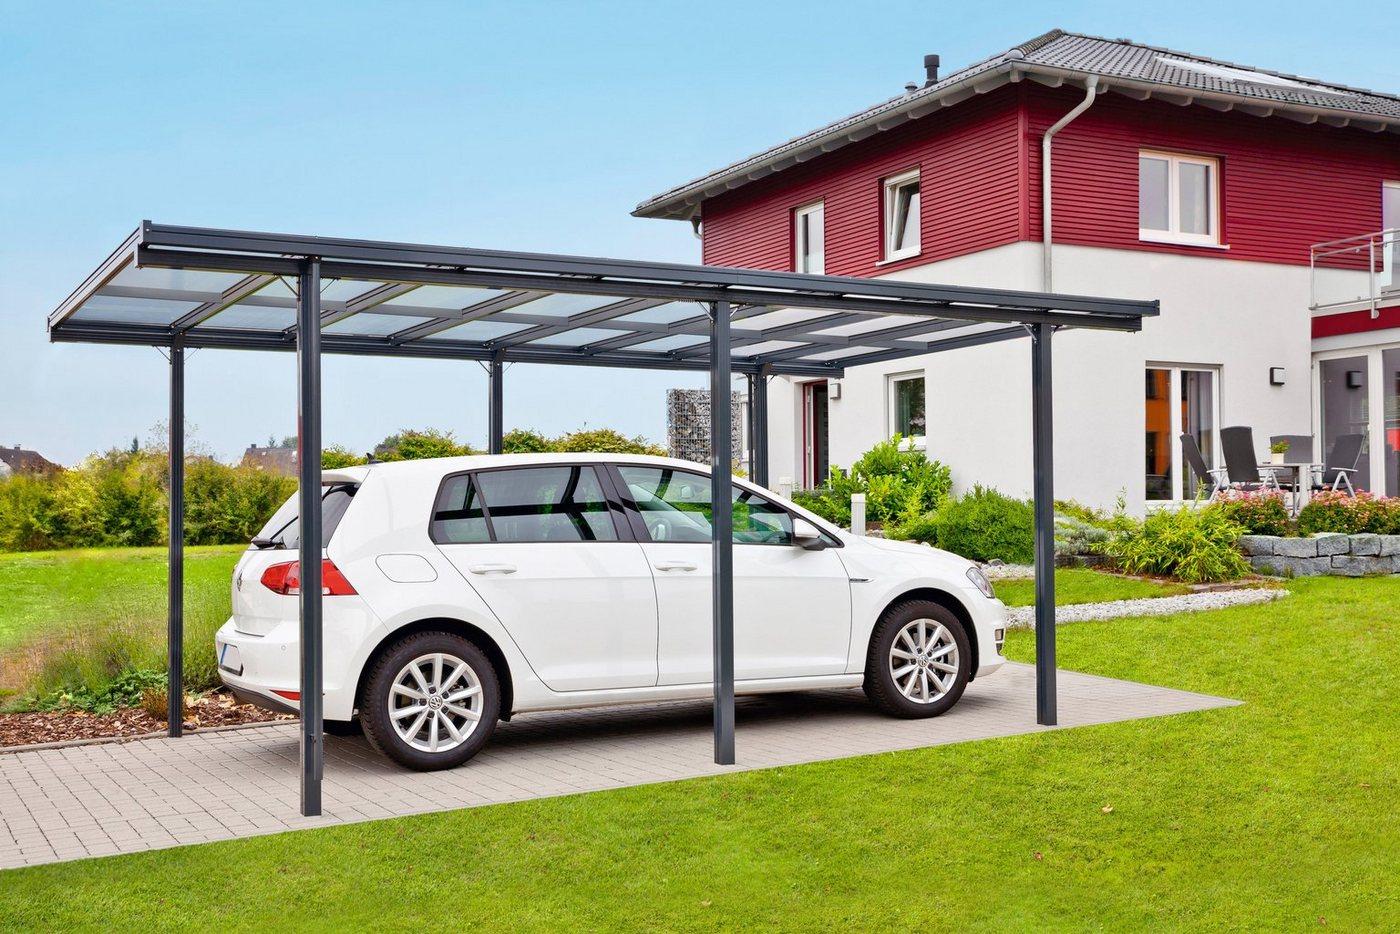 dachrinnen aluminium preisvergleiche erfahrungsberichte. Black Bedroom Furniture Sets. Home Design Ideas